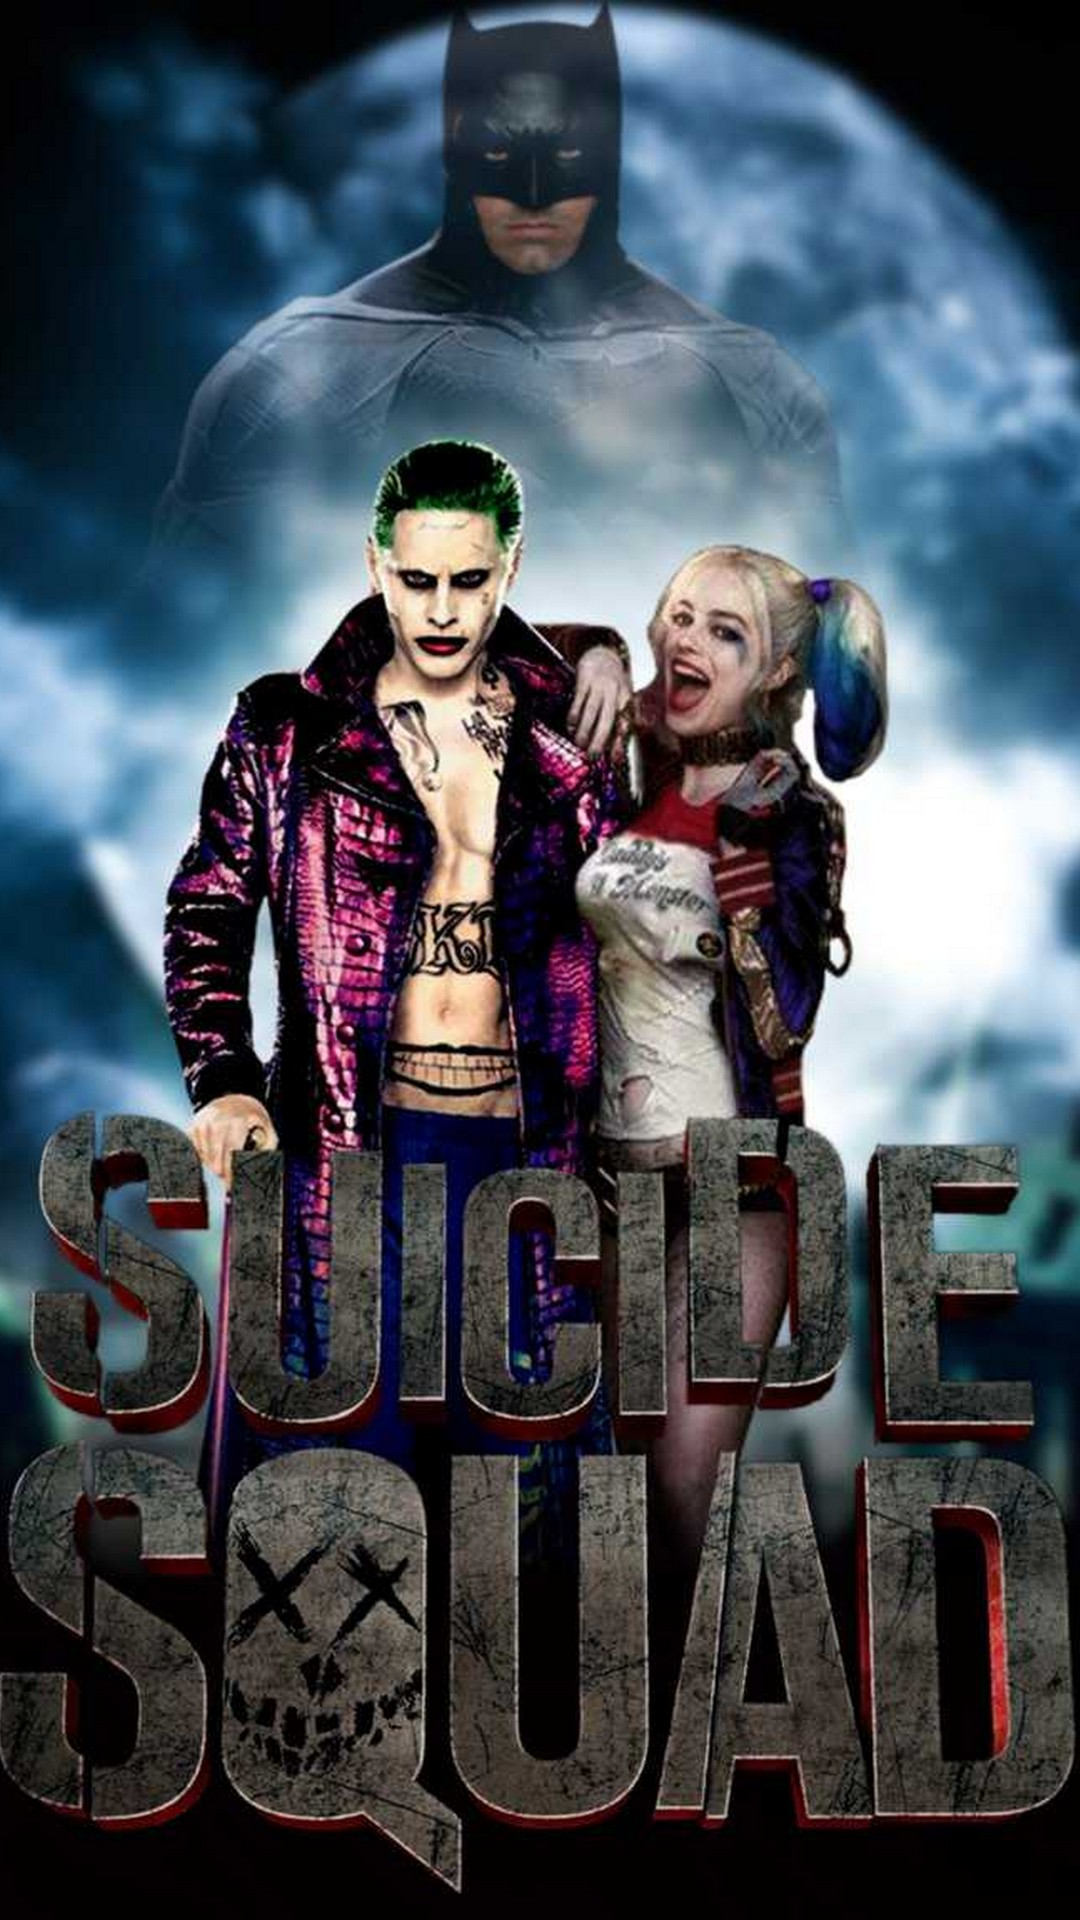 Free IPhone Wallpaper Harley Quinn And Joker 2019